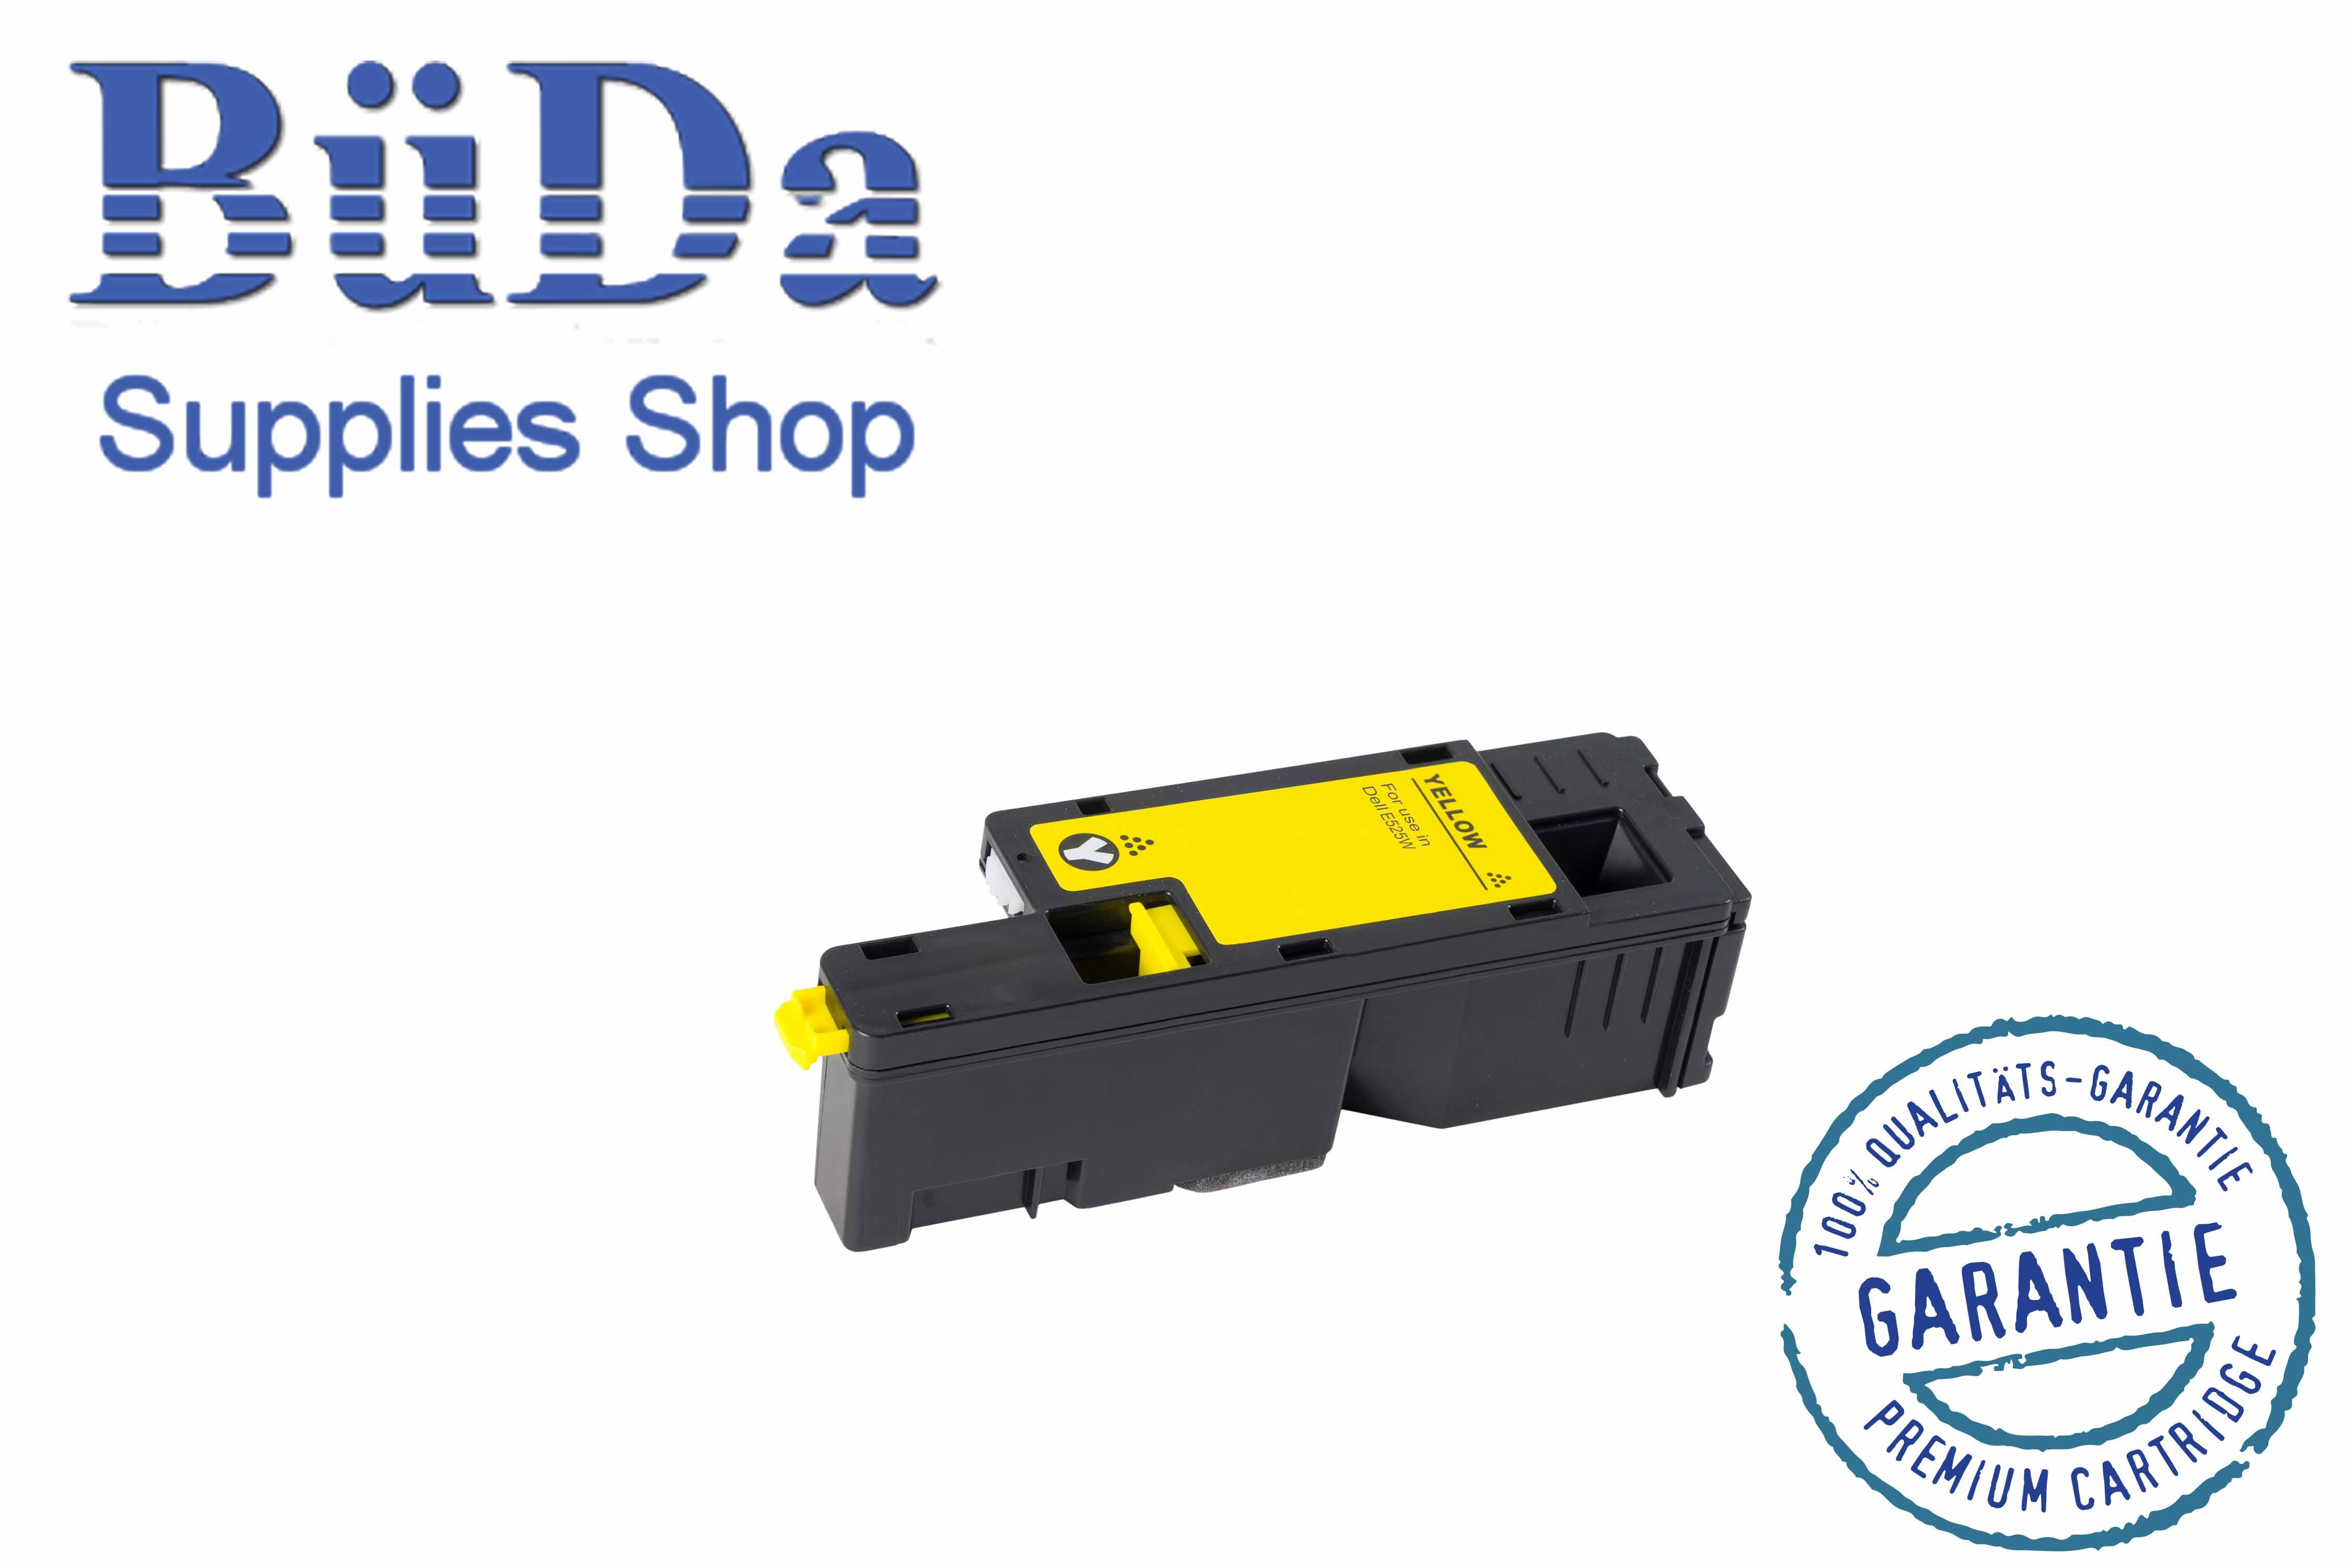 Toner-Modul komp. zu Dell E525W yellow 1400 Seiten